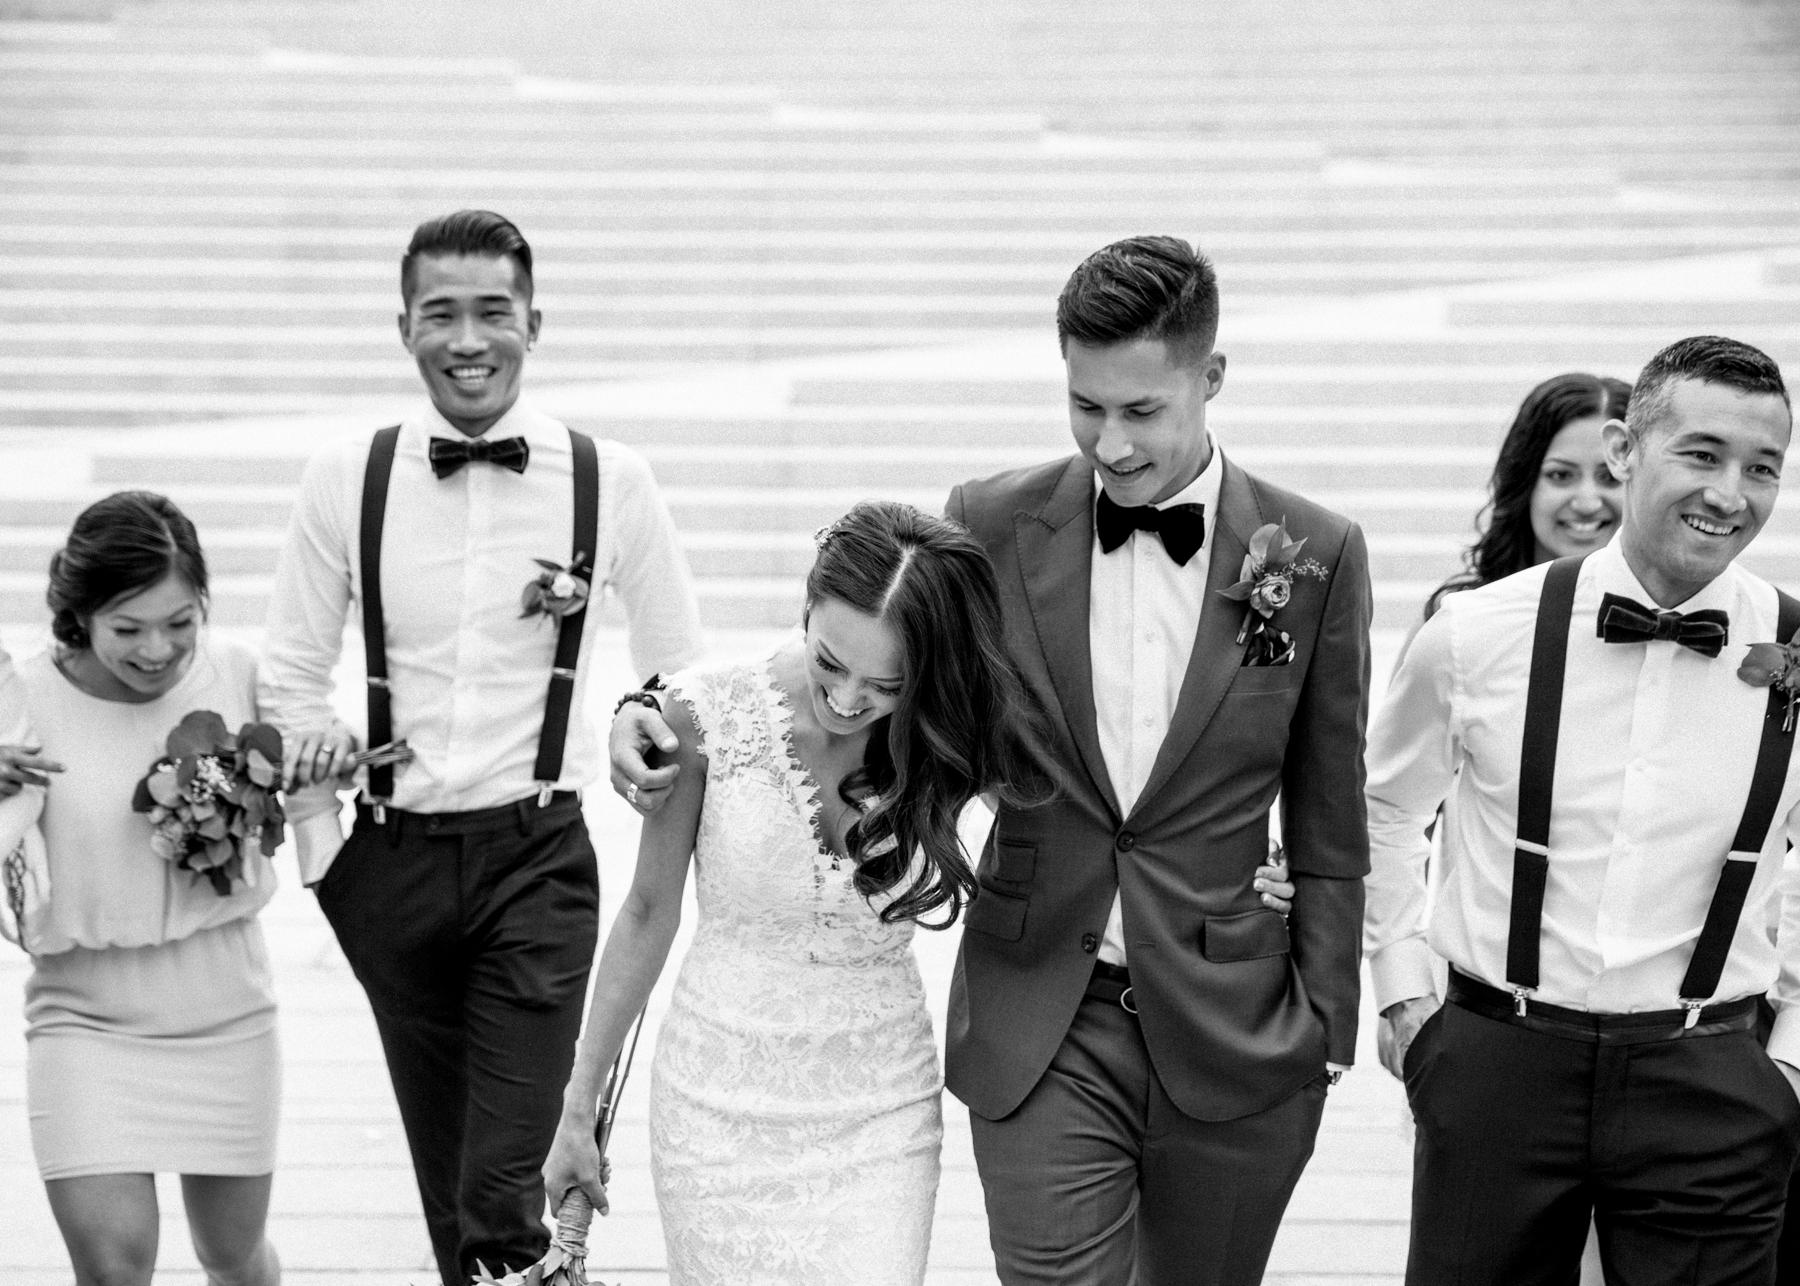 kaoverii_silva_photographer_via-herafilms_kieu_kaz_wedding-19.jpg